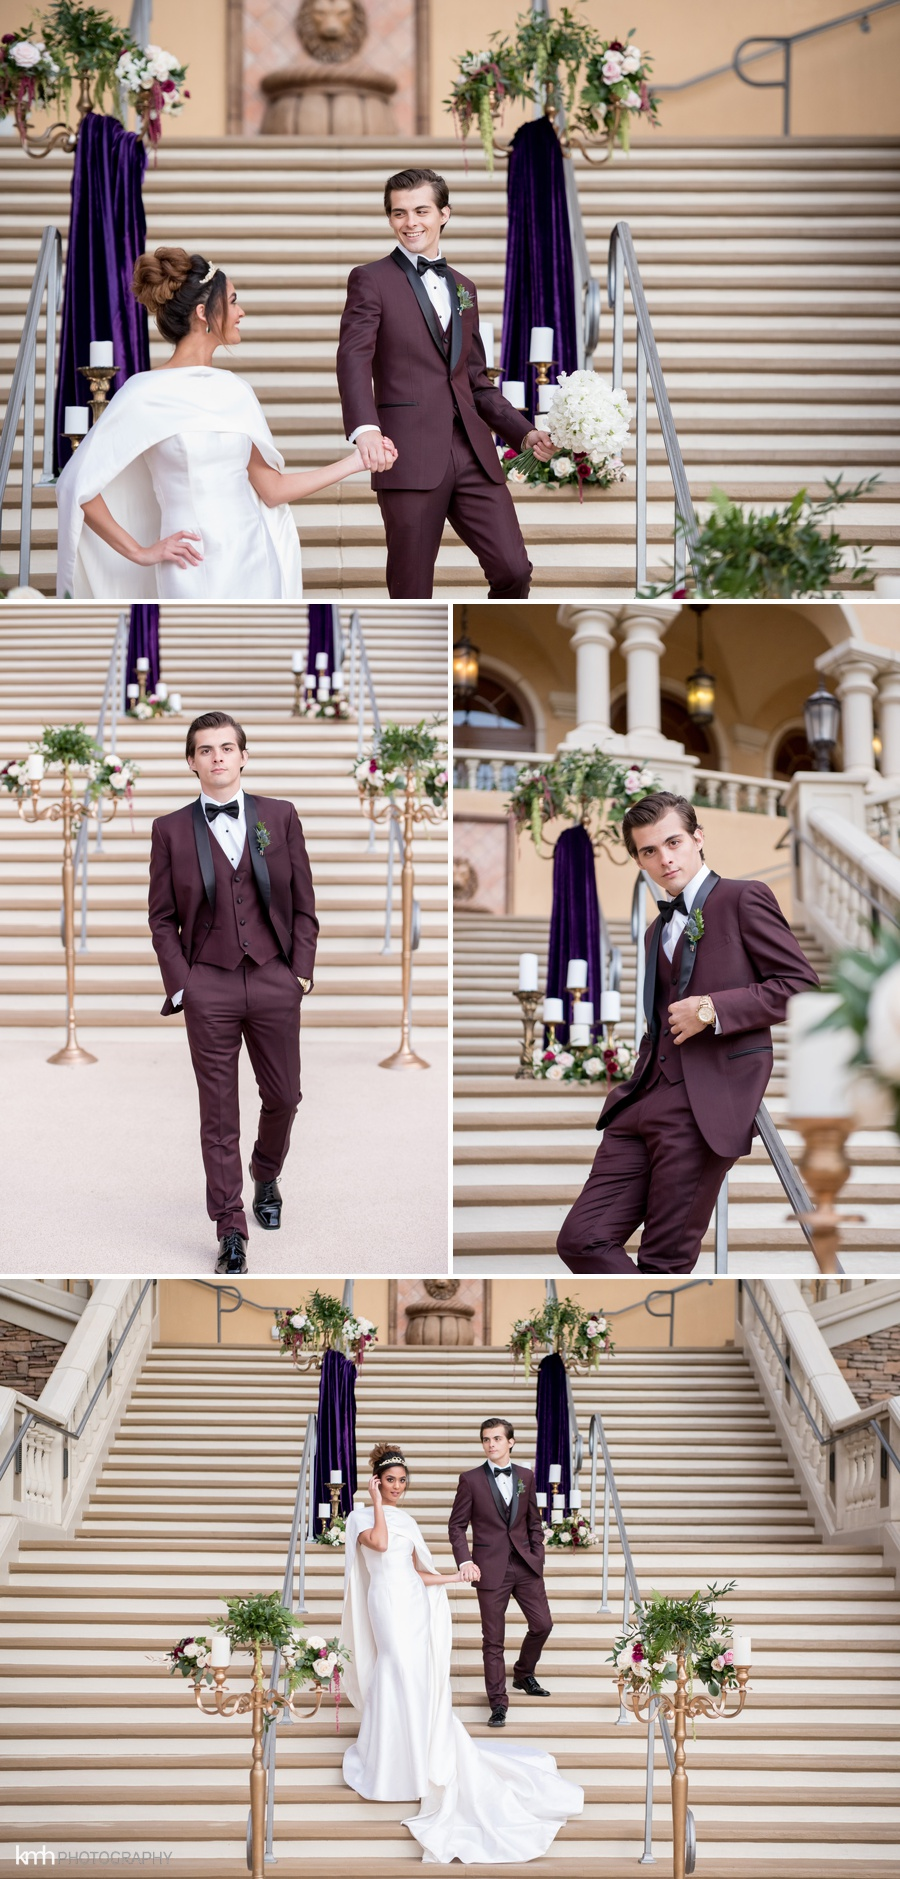 Royal Wedding Inspiration | Green Valley Ranch Resort in Las Vegas, NV | KMH Photography, Las Vegas Wedding Photographer